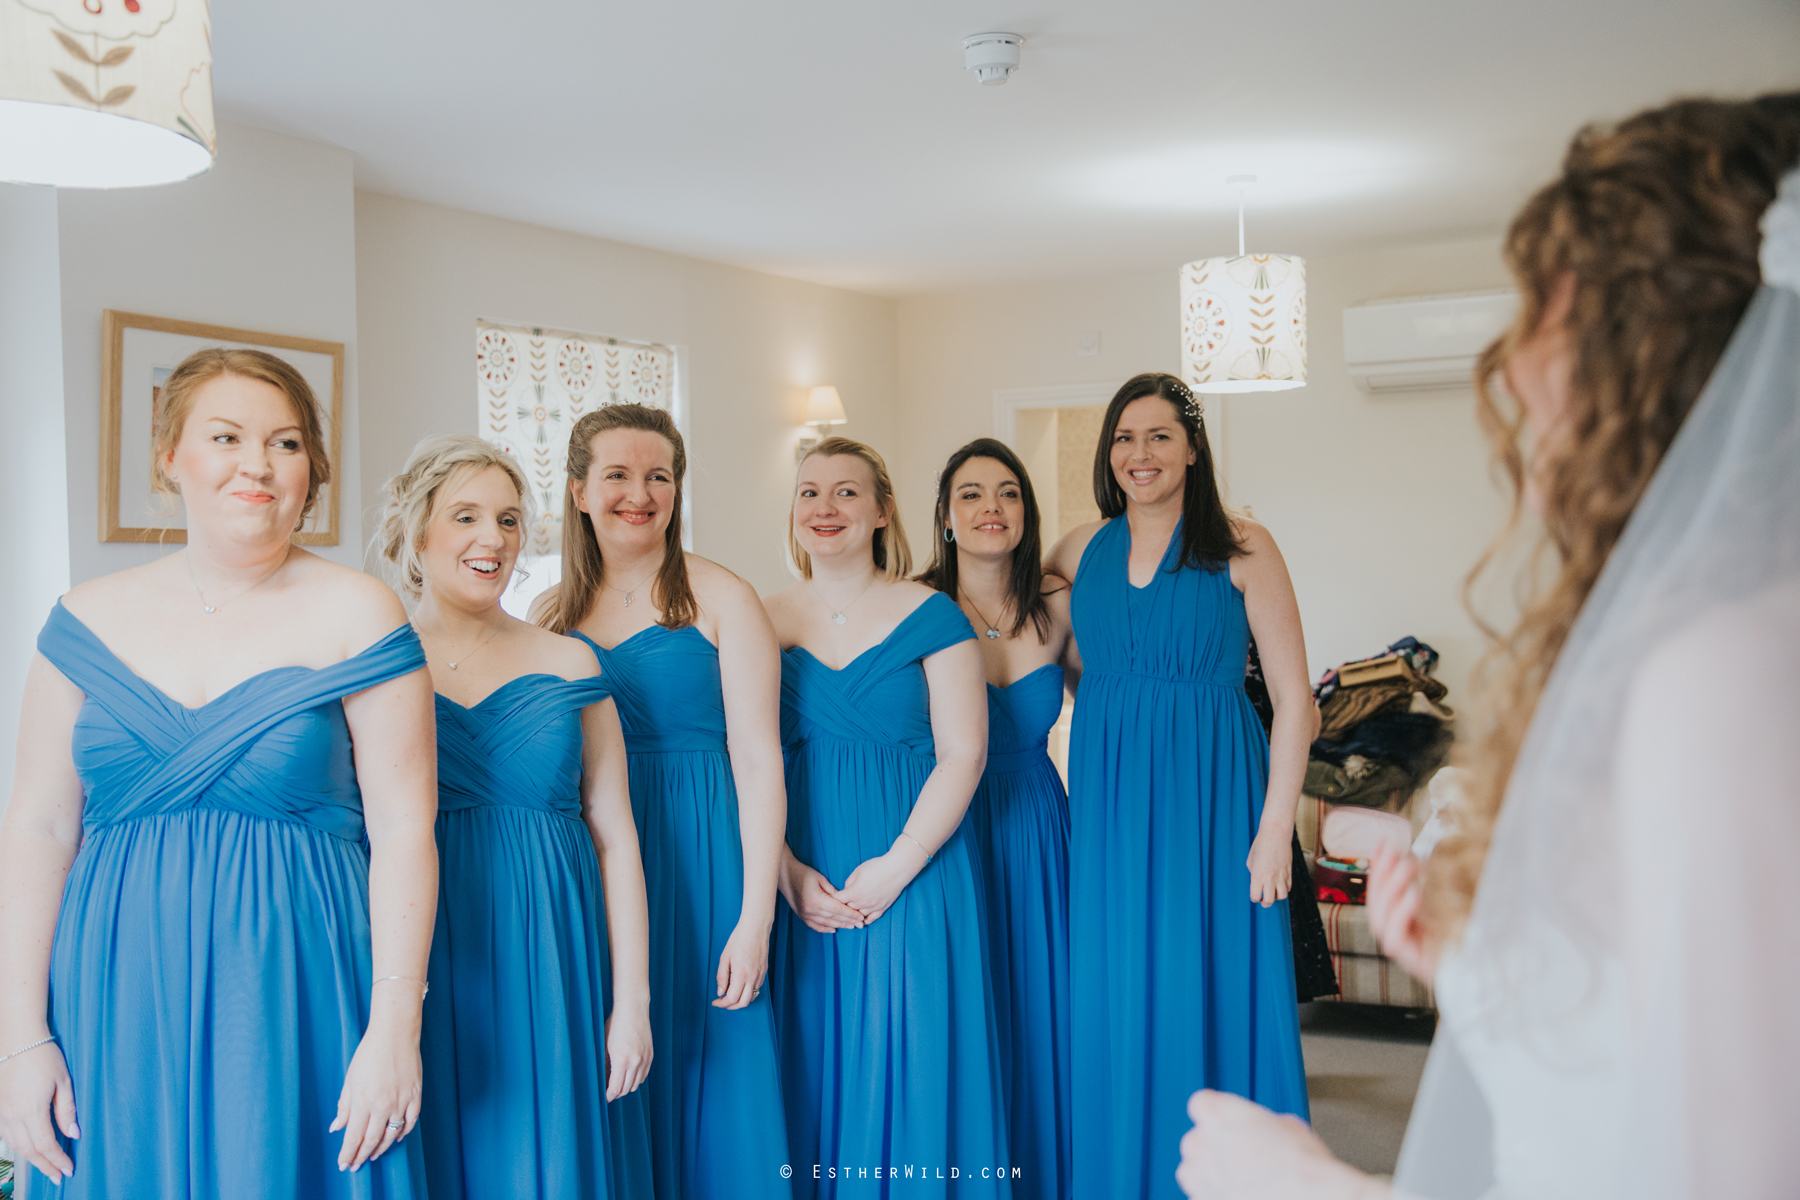 The_BoatHouse_Wedding_Venue_Ormesby_Norfolk_Broads_Boat_Wedding_Photography_Esther_Wild_Photographer_IMG_0588.jpg